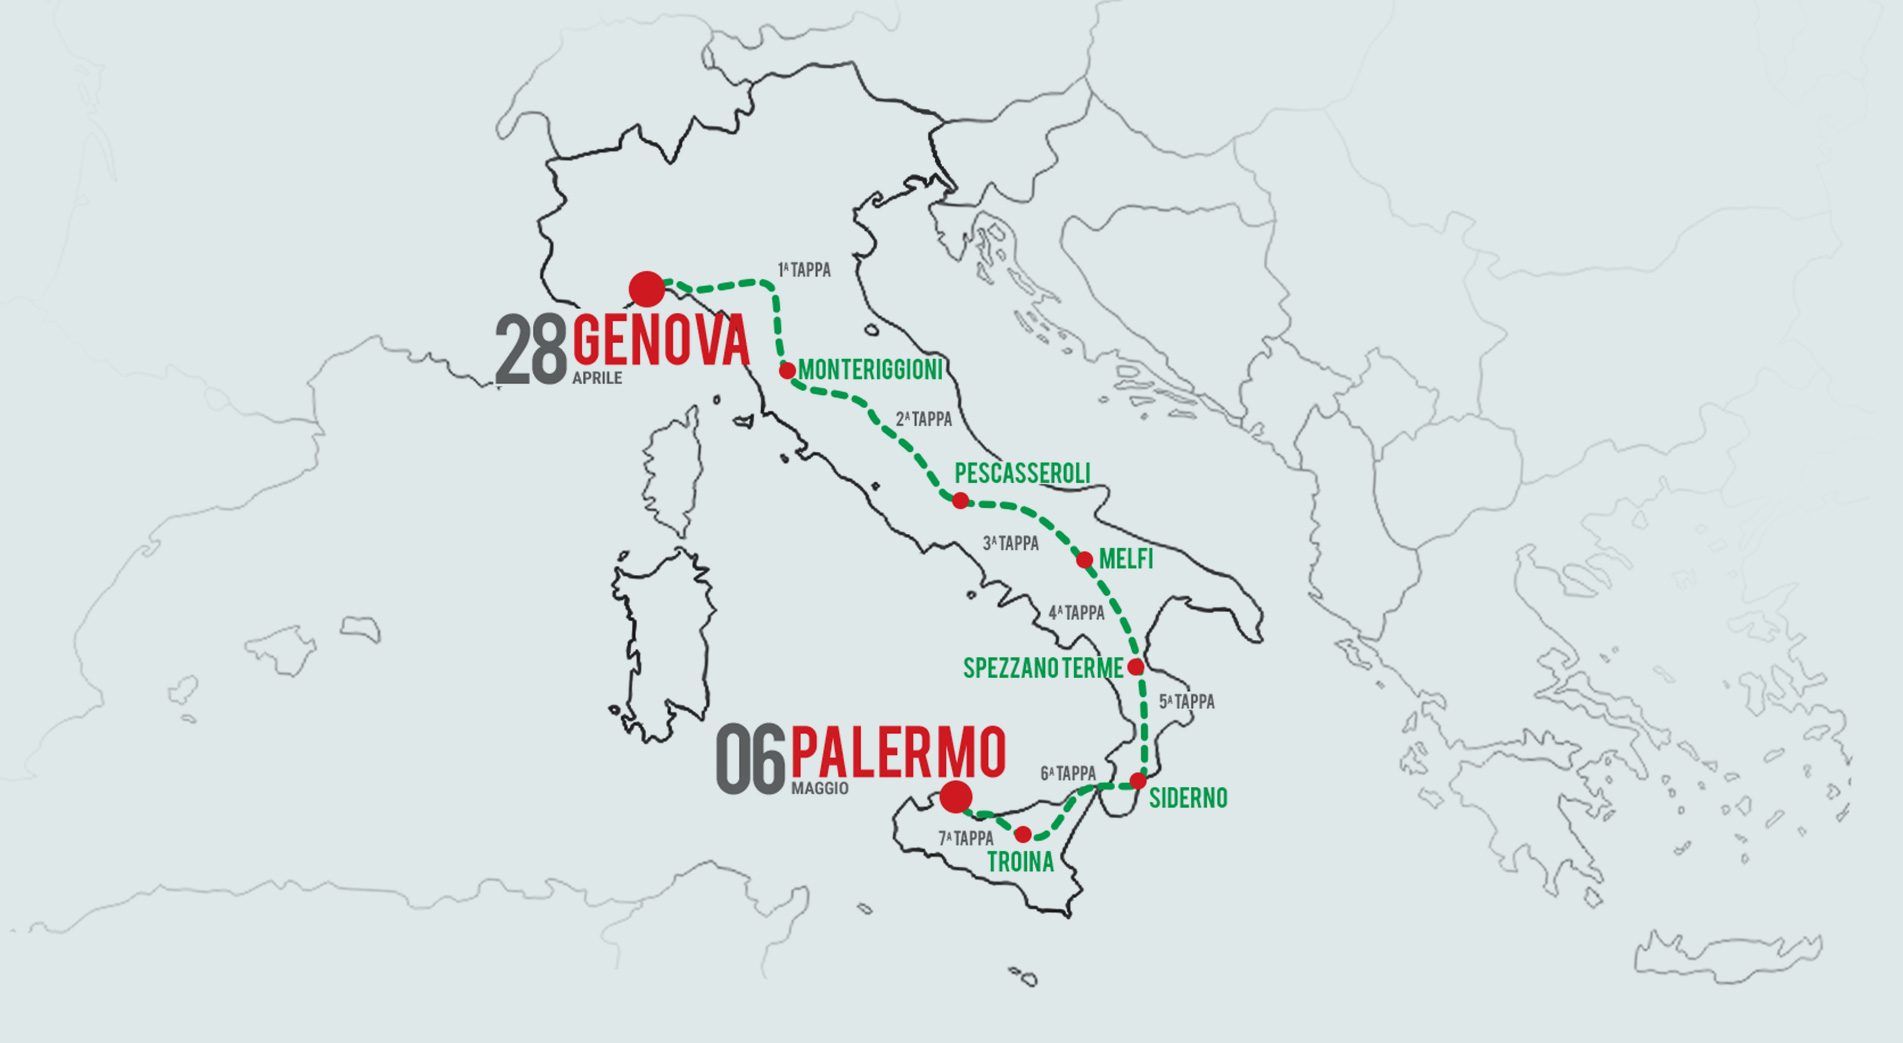 Genova Palermo